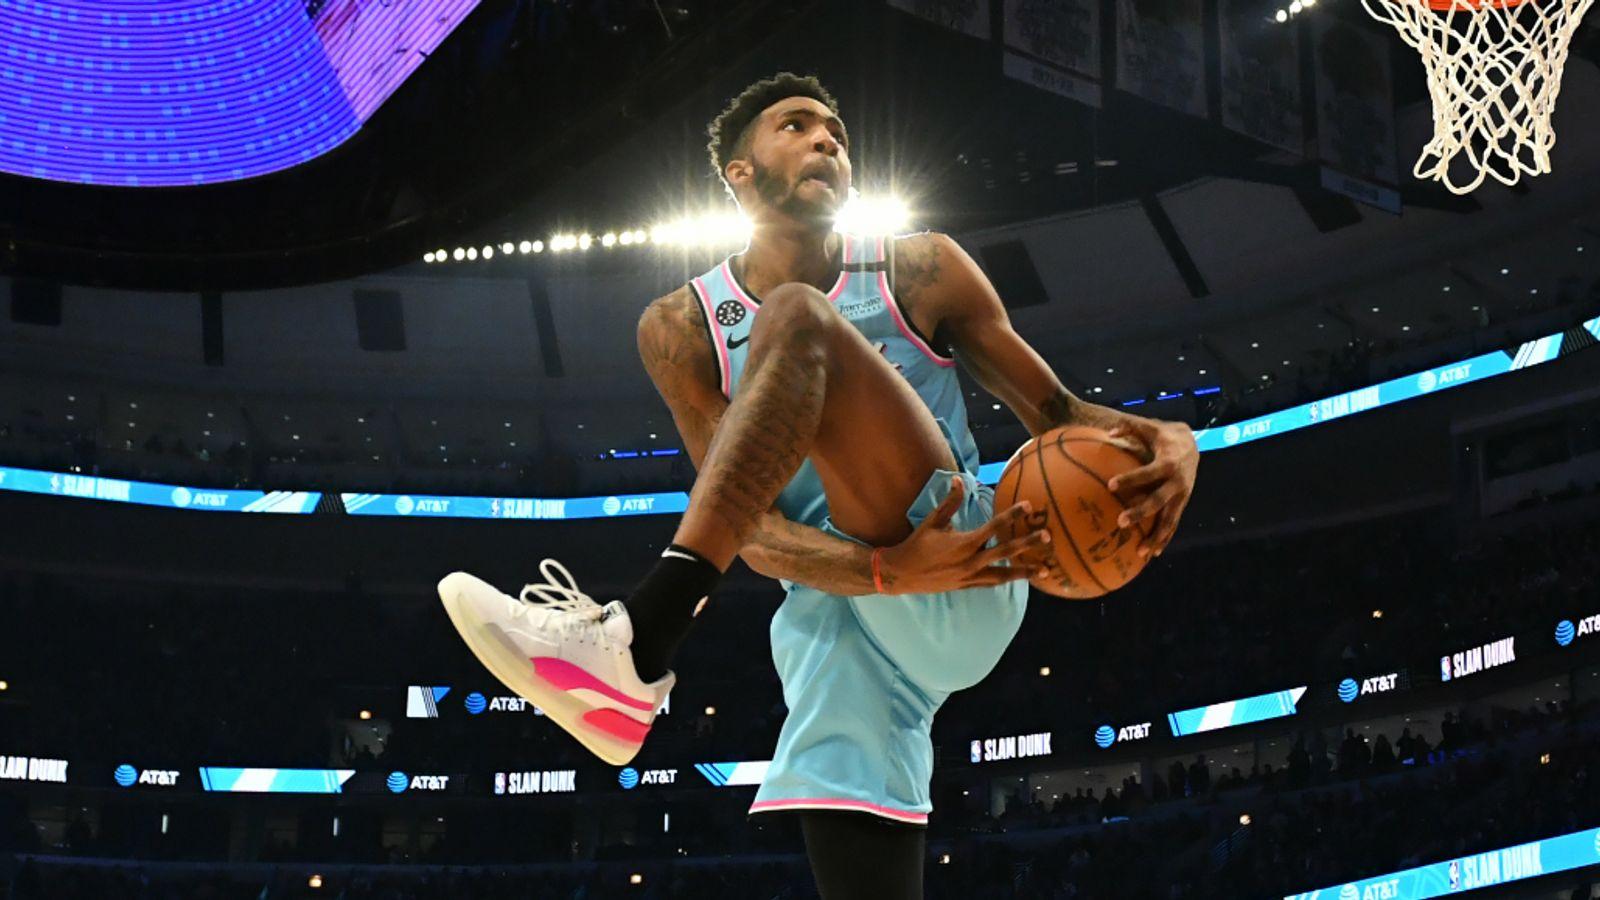 Derrick Jones Jr. 'upsets' Kevin Durant in NBA 2K Players Tournament